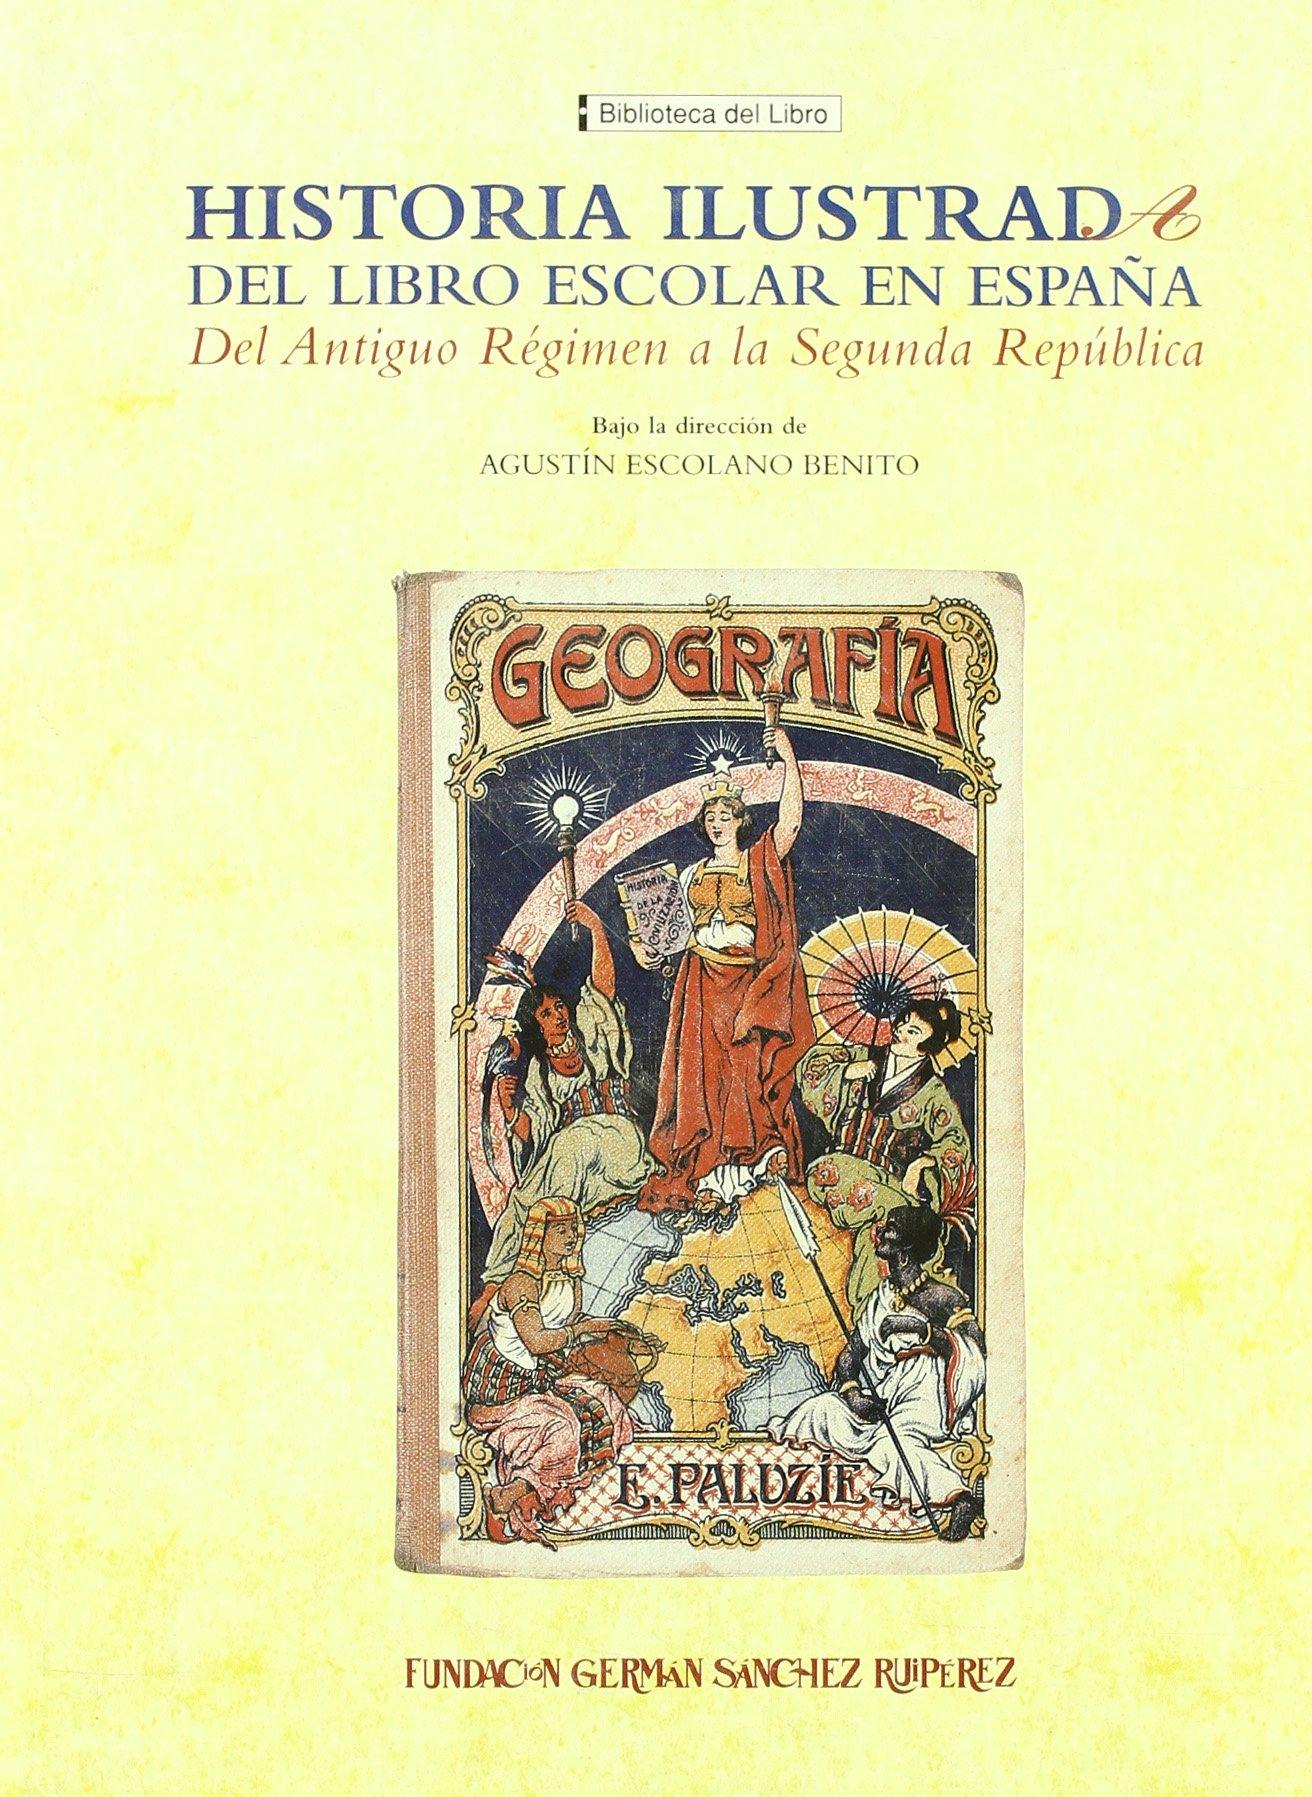 H.I.L.E.E. Del antiguo regimen a la segunda república Biblioteca del Libro: Amazon.es: Escolano Benito, Agustín: Libros